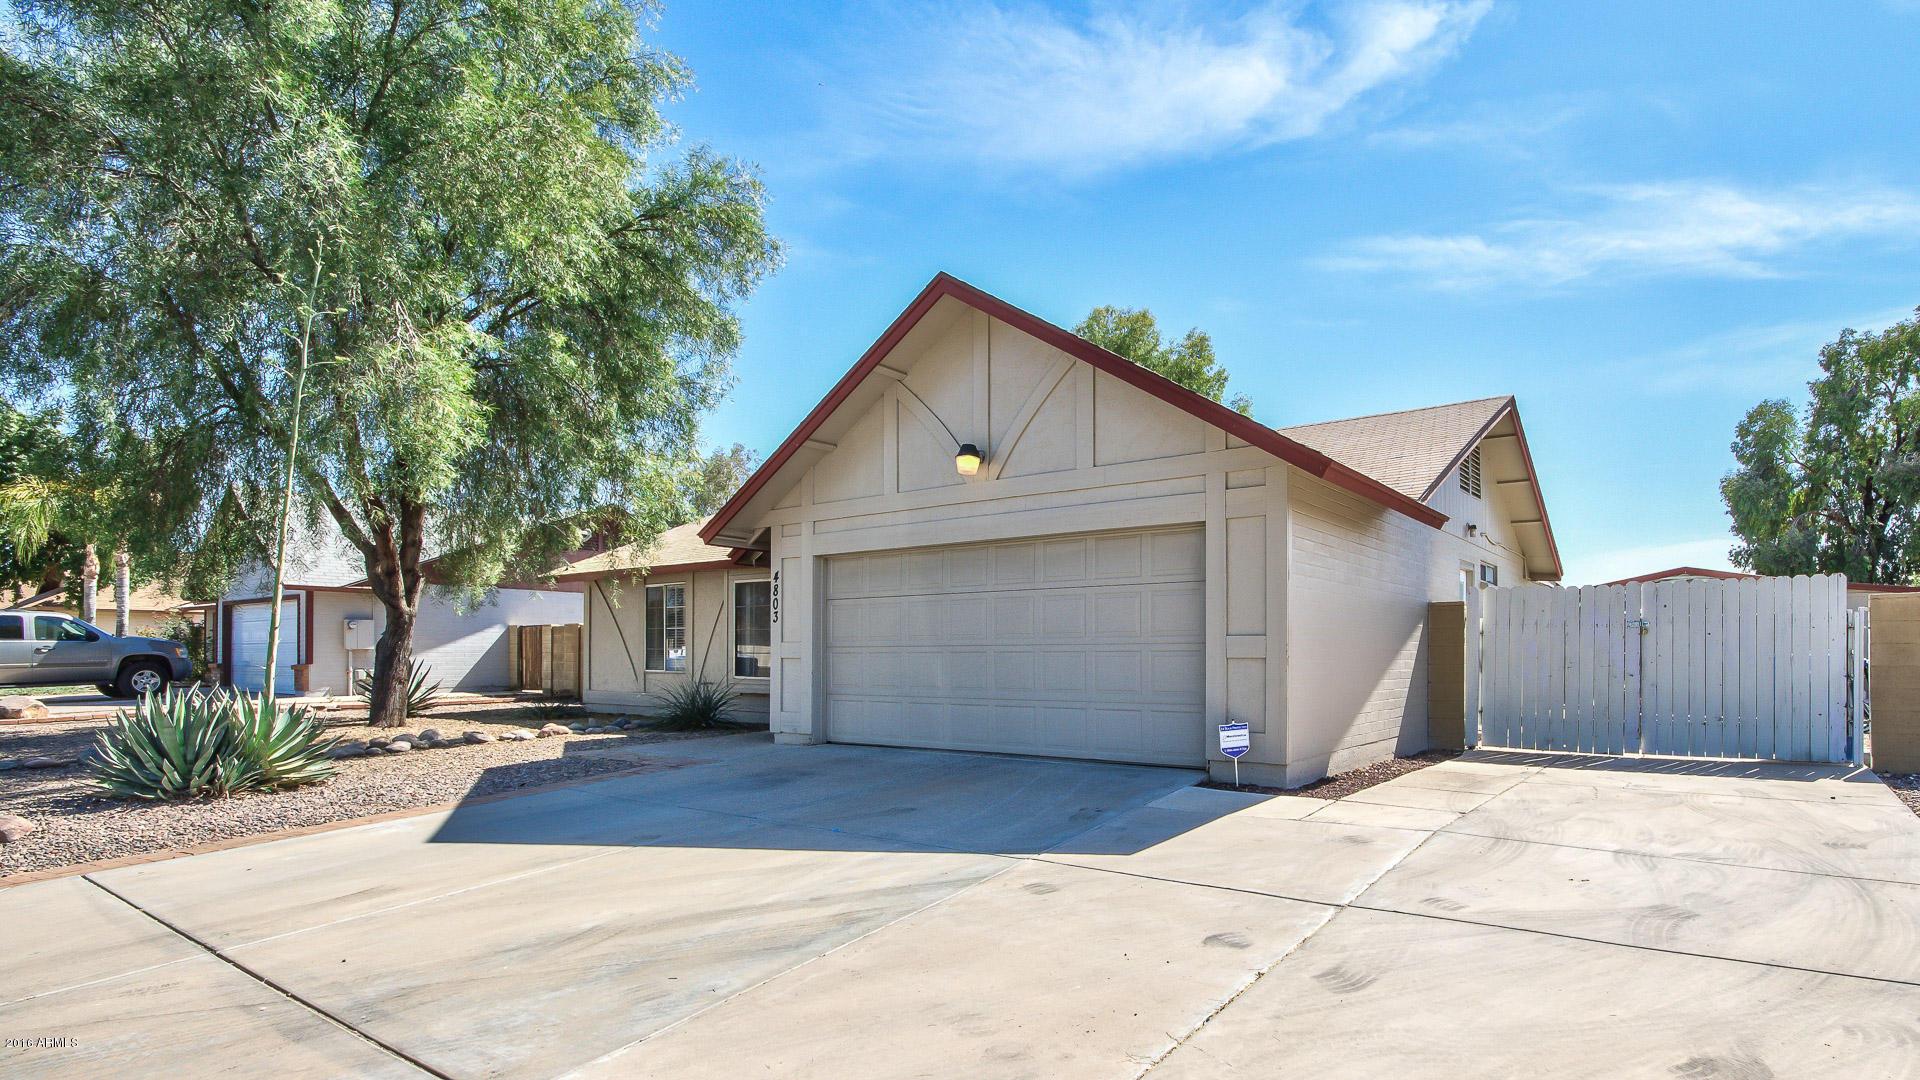 Search Real Estate Listings, ARMLS | KimAndHenry.com